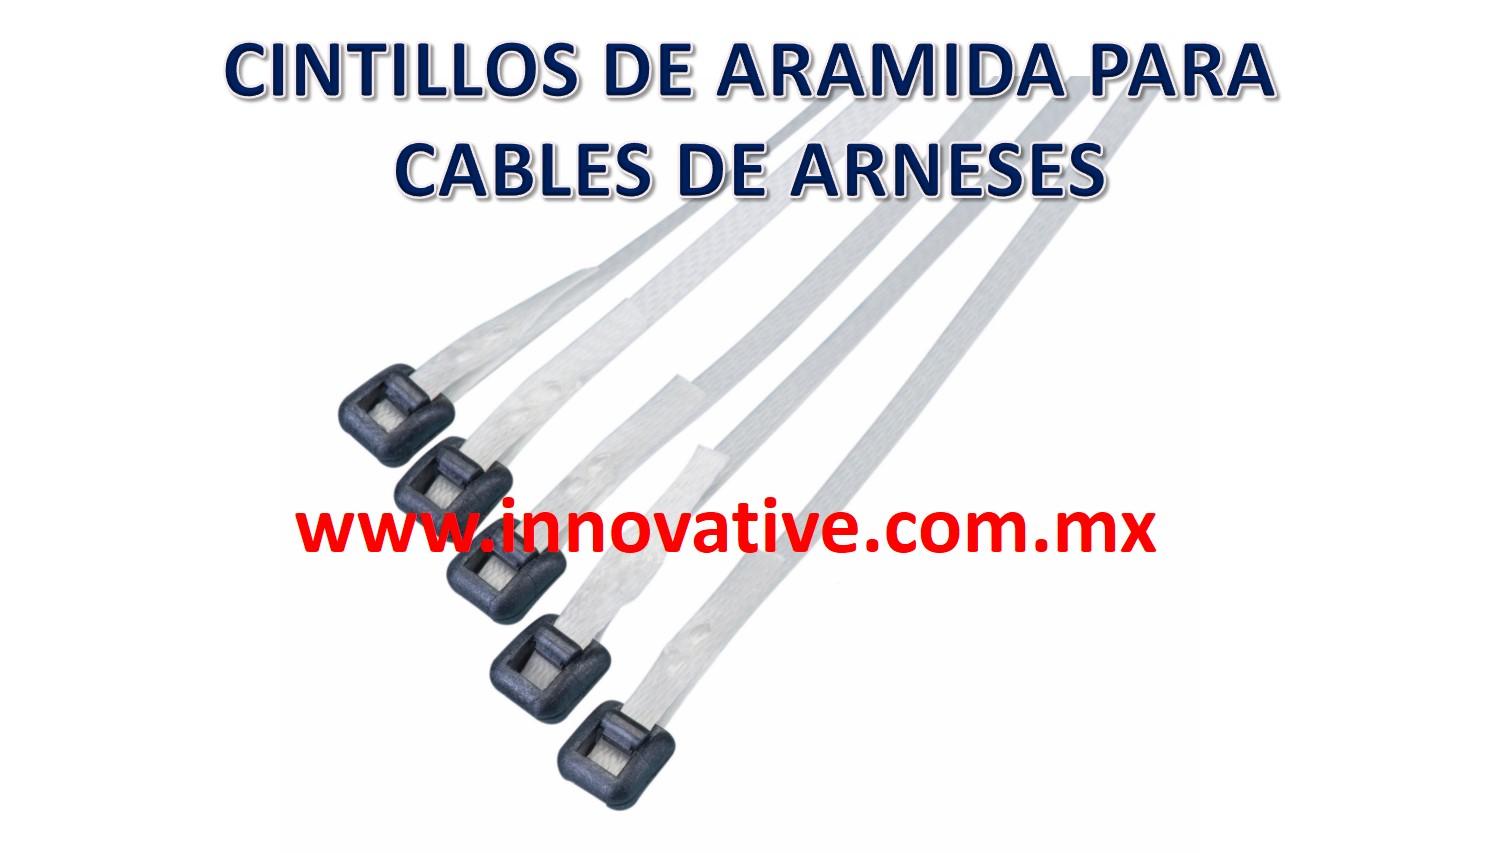 CINTILLOS DE ARAMIDA PARA CABLES DE ARNESES